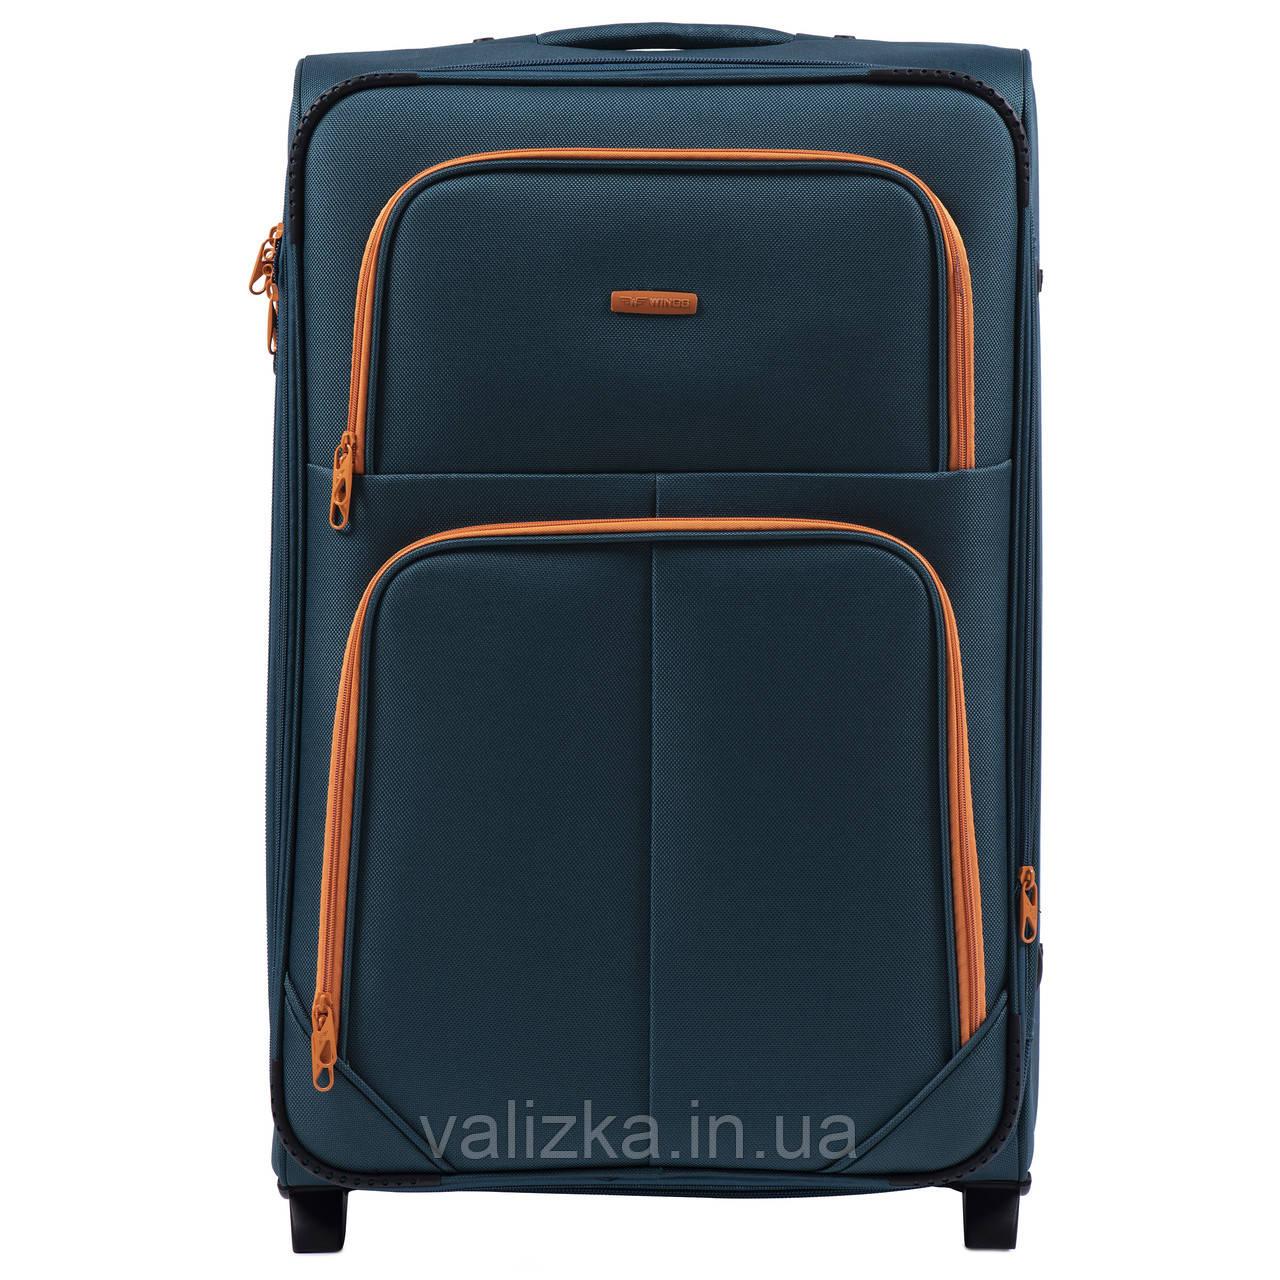 Большой текстильный чемодан темно-синий на 2-х колесах  Wings 214